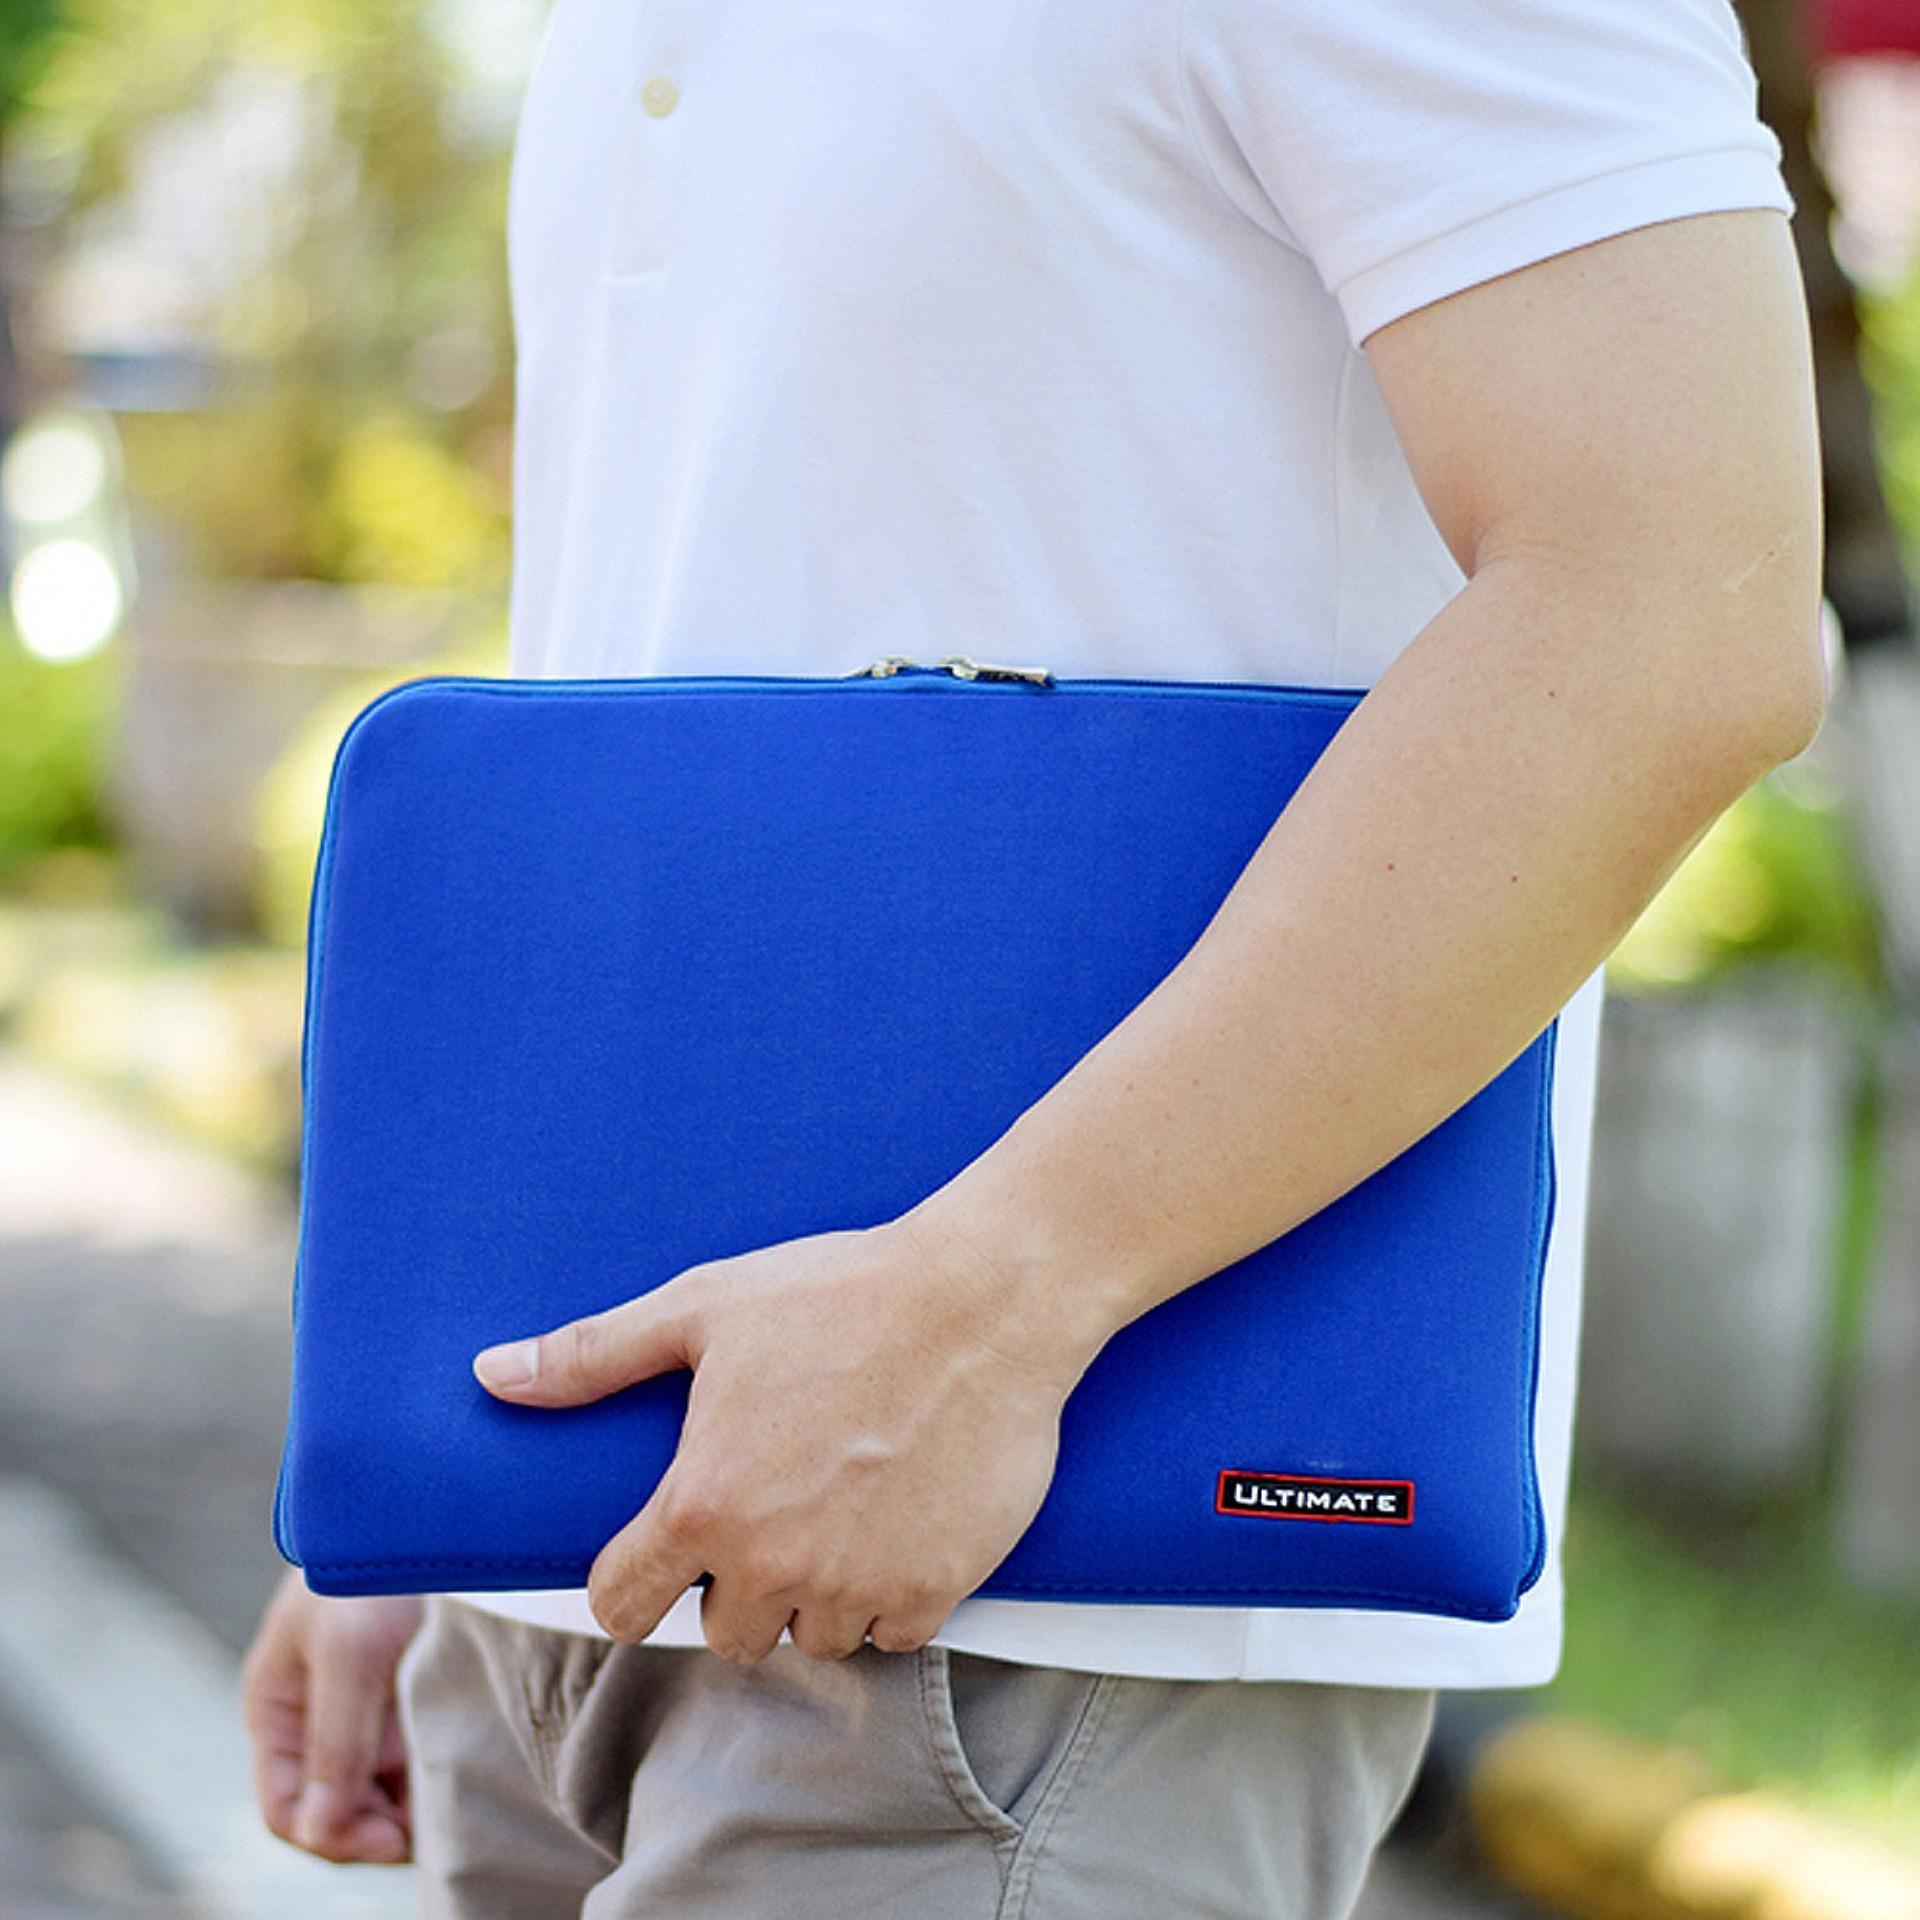 ULTIMATE Tas Laptop Jinjing / Cover Laptop / Bag Cover / Softcase / Backpack Laptop pria